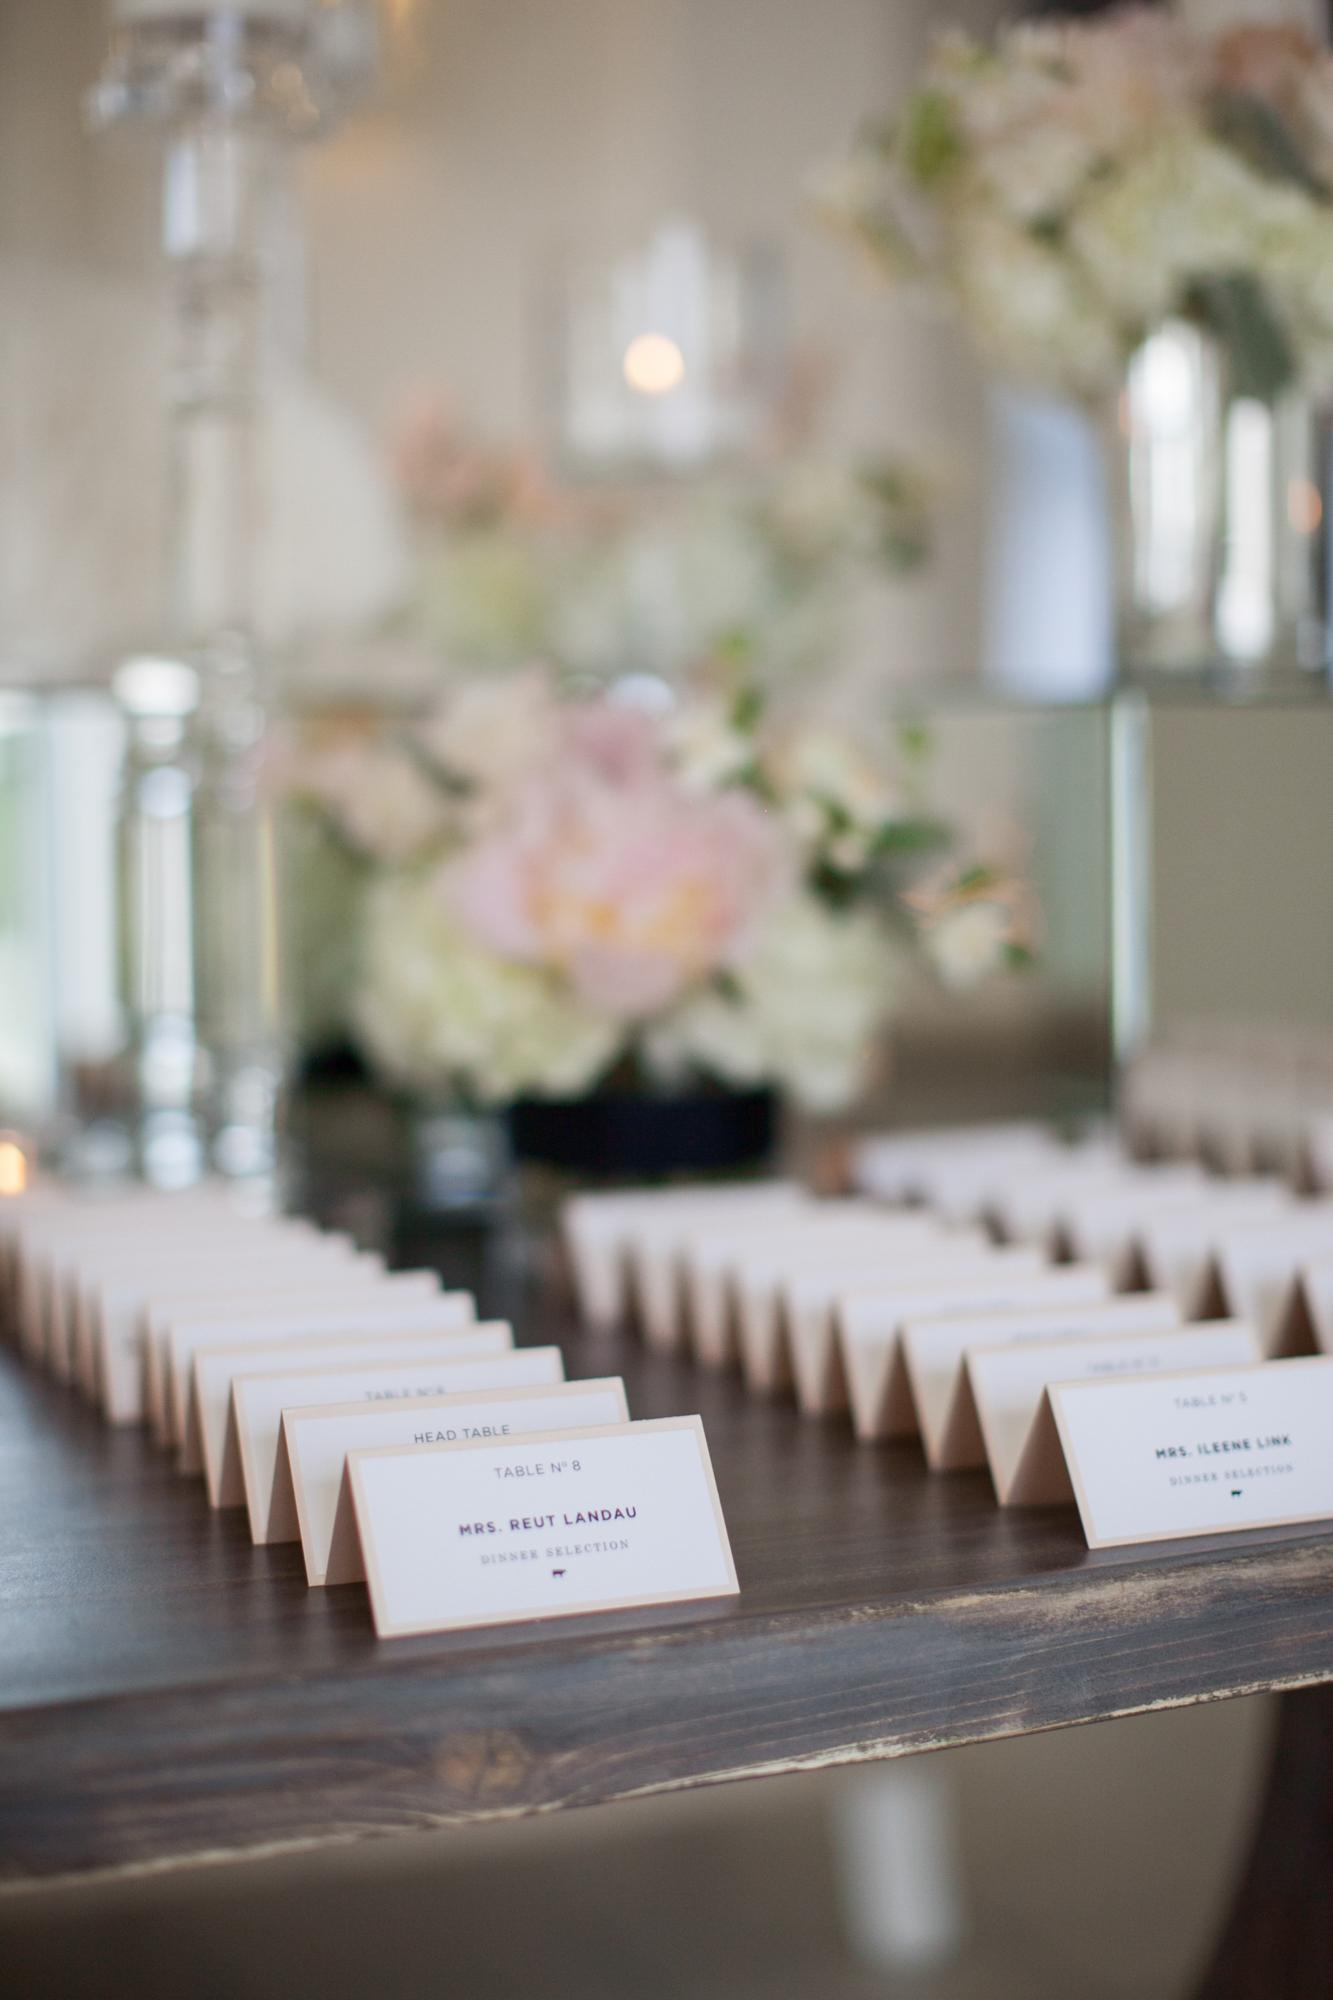 JB_Belle-Mer-Newport-Wedding-Champagne-and-Ink-Blush-Gold-Details-NewportWedding-Inspo-31.jpg